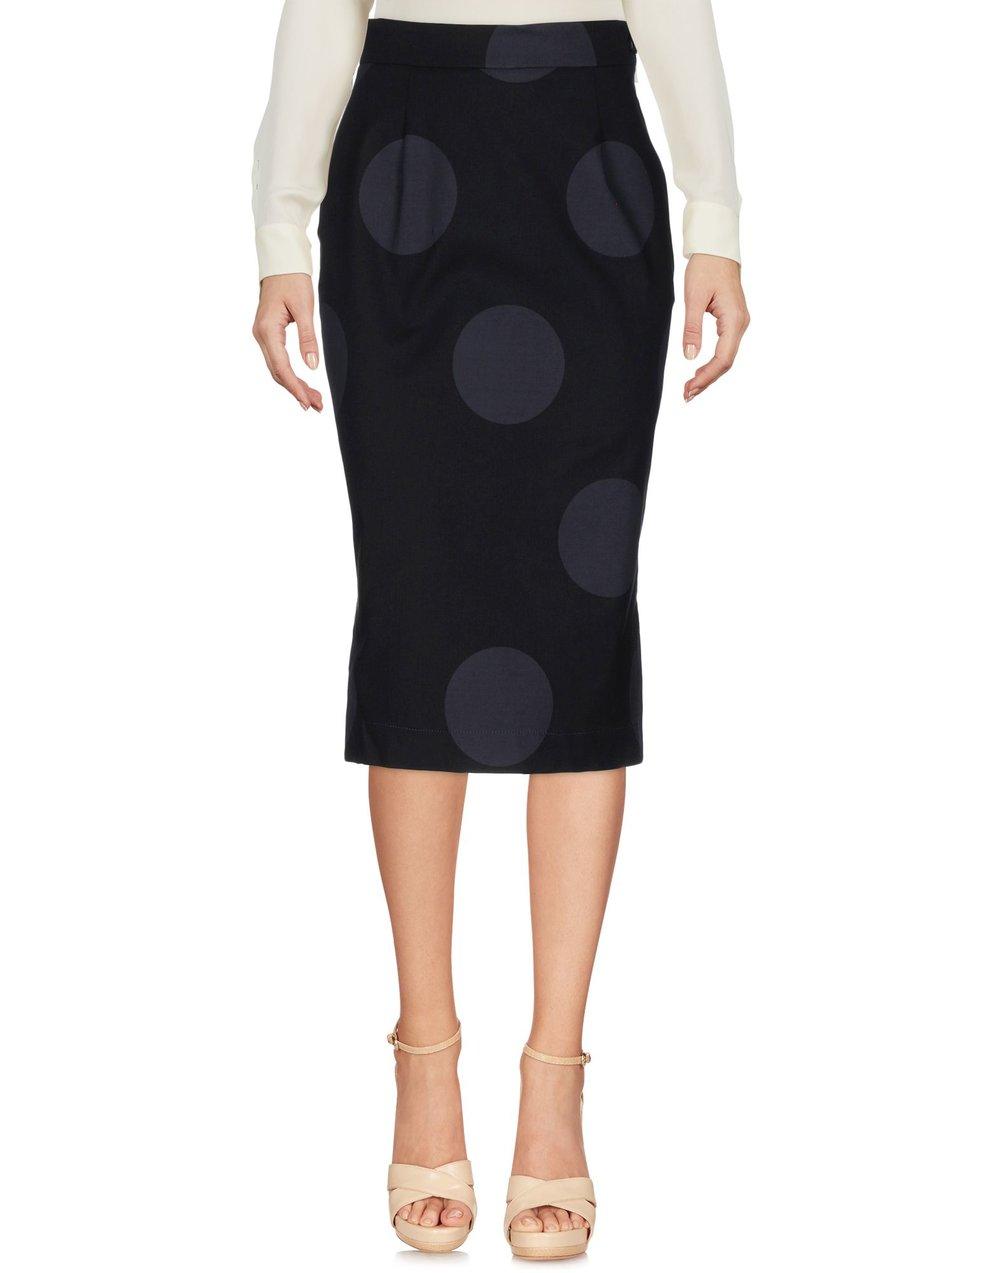 $250 - Vivienne Westwood Anglomania Skirt